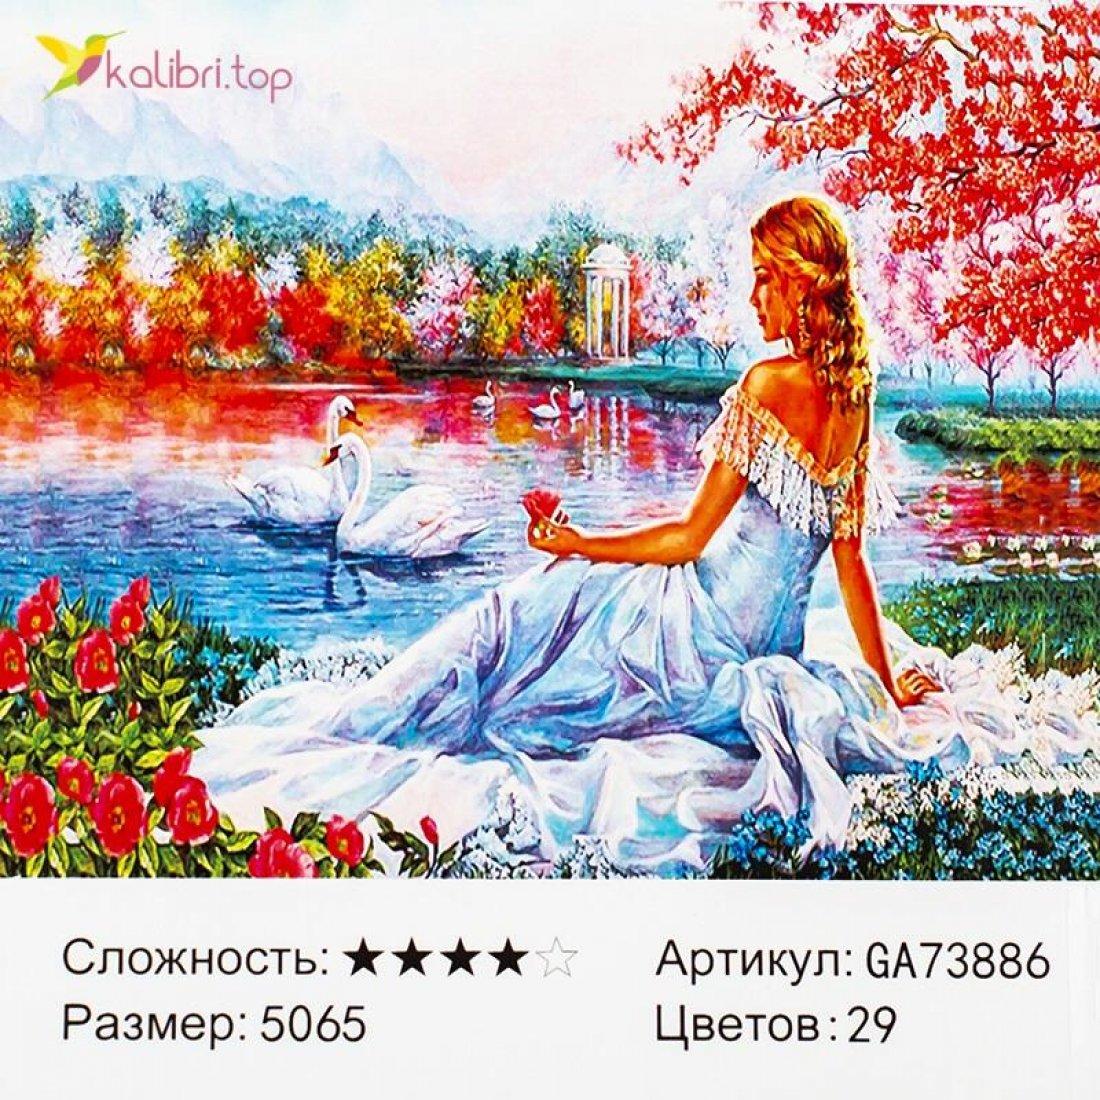 Алмазная мозаика по номерам Девушка и Лебеди 40*50 см оптом фото 66